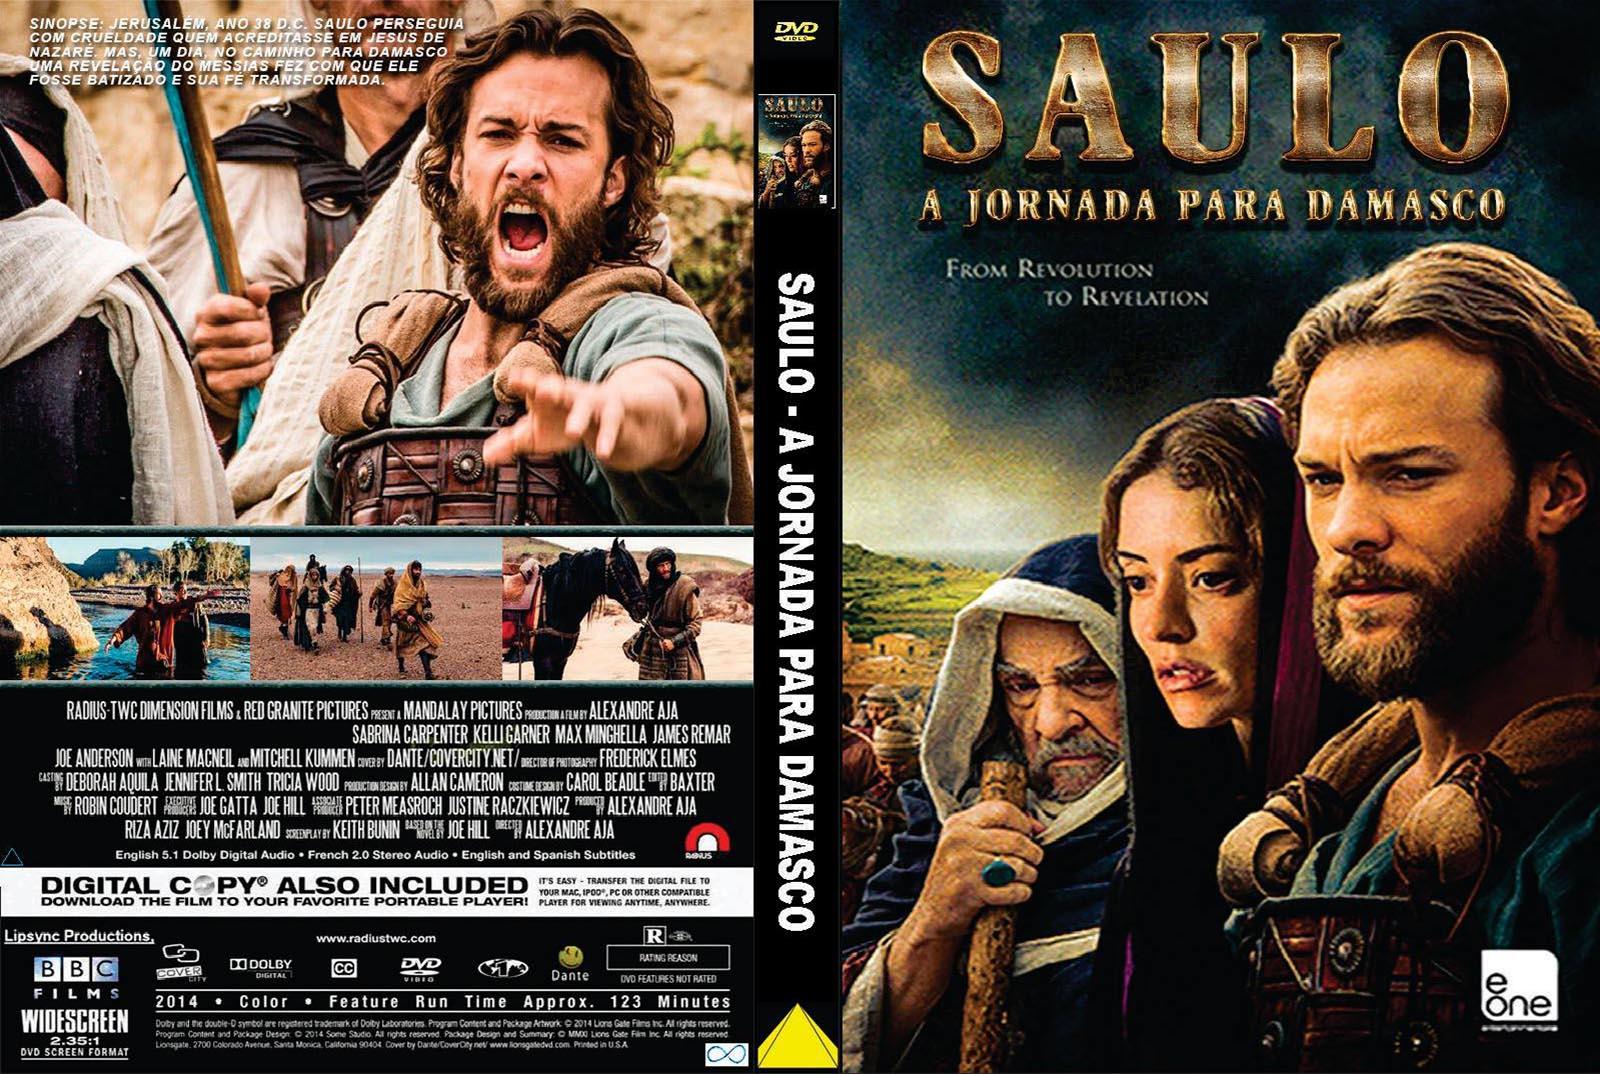 Download Saulo A Jornada para Damasco HDRip XviD Dublado SAULO 2B  2BA 2BJORNADA 2BPARA 2BDAMASCO